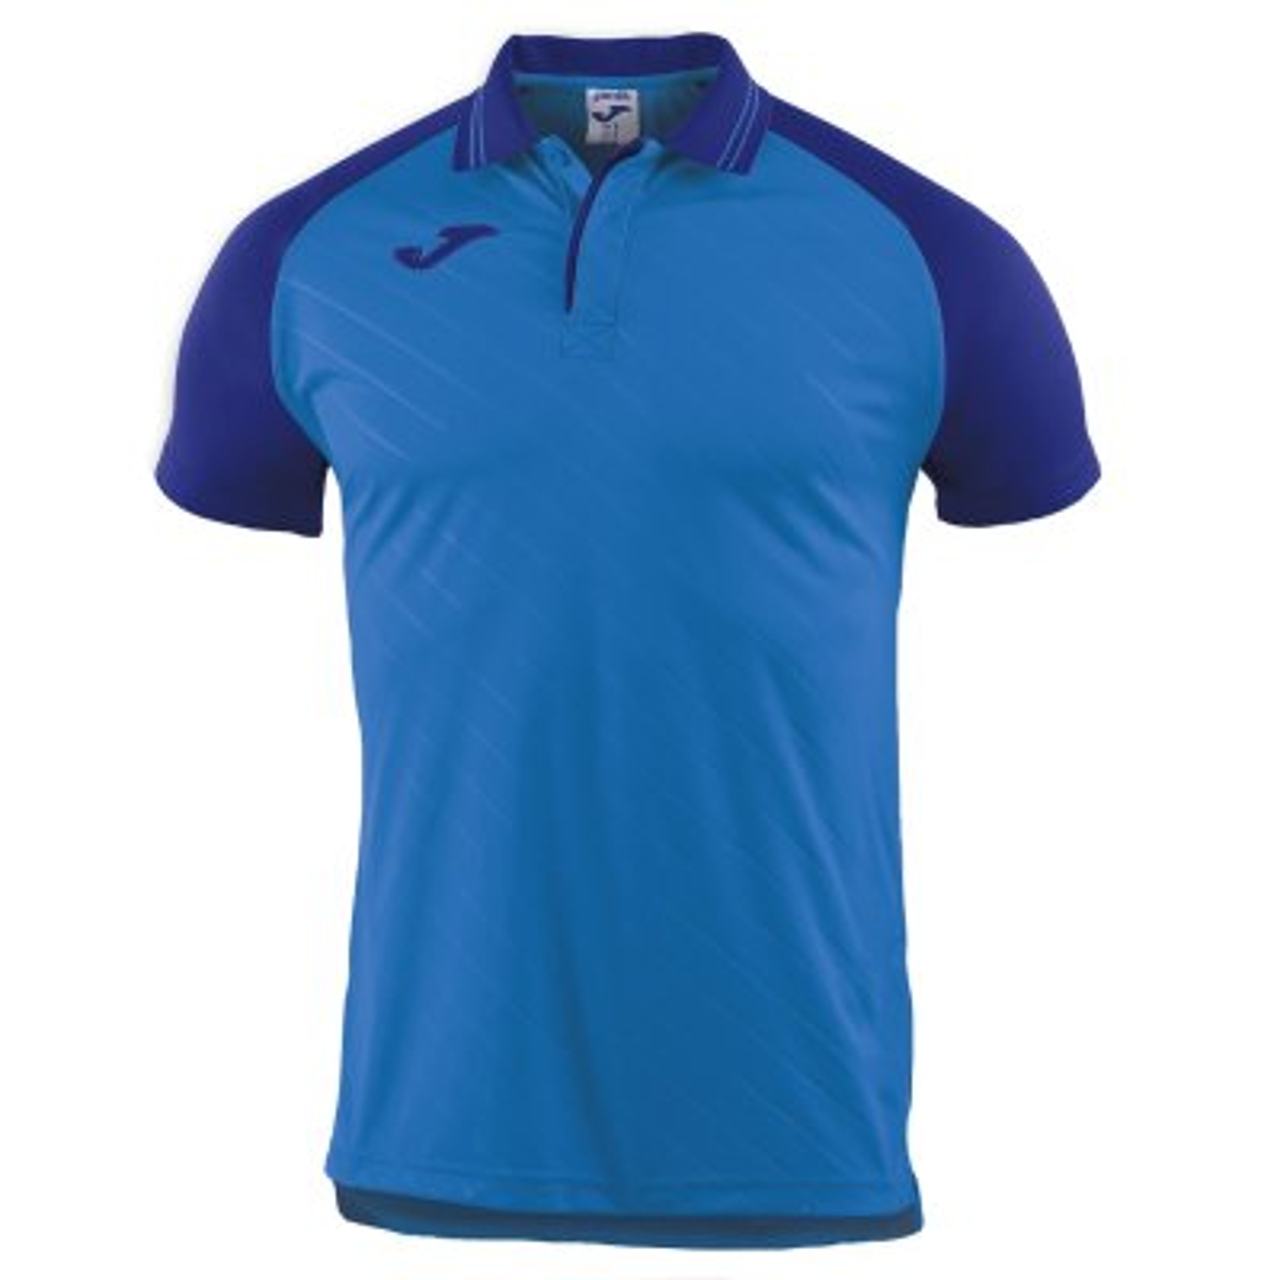 پلوشرت مردانه جوما مدل TORENO II BLUE ROYAL